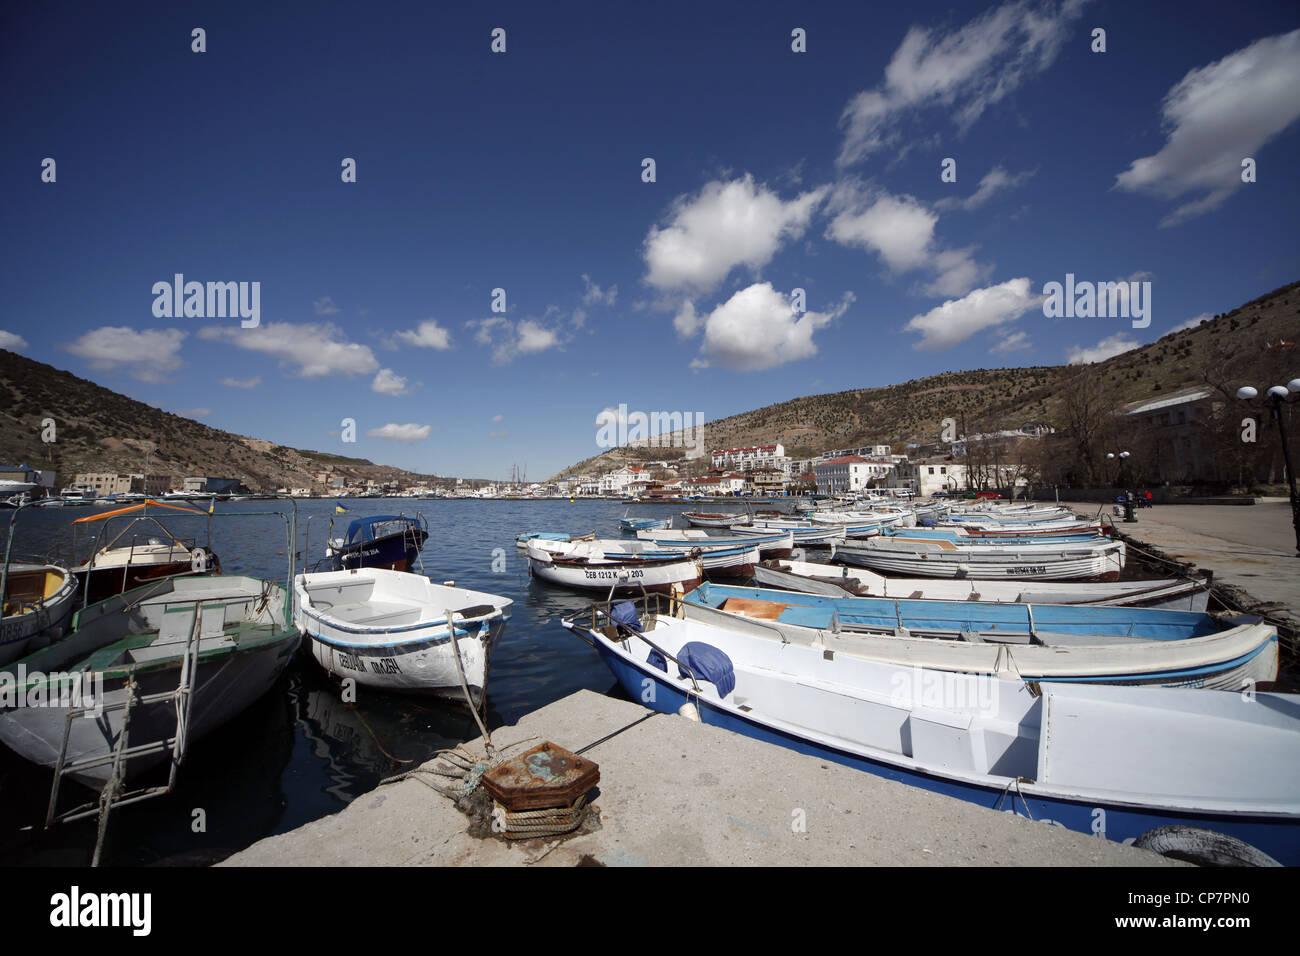 Boote im Hafen BALAKLAWA Krim UKRAINE 2. April 2012 Stockbild